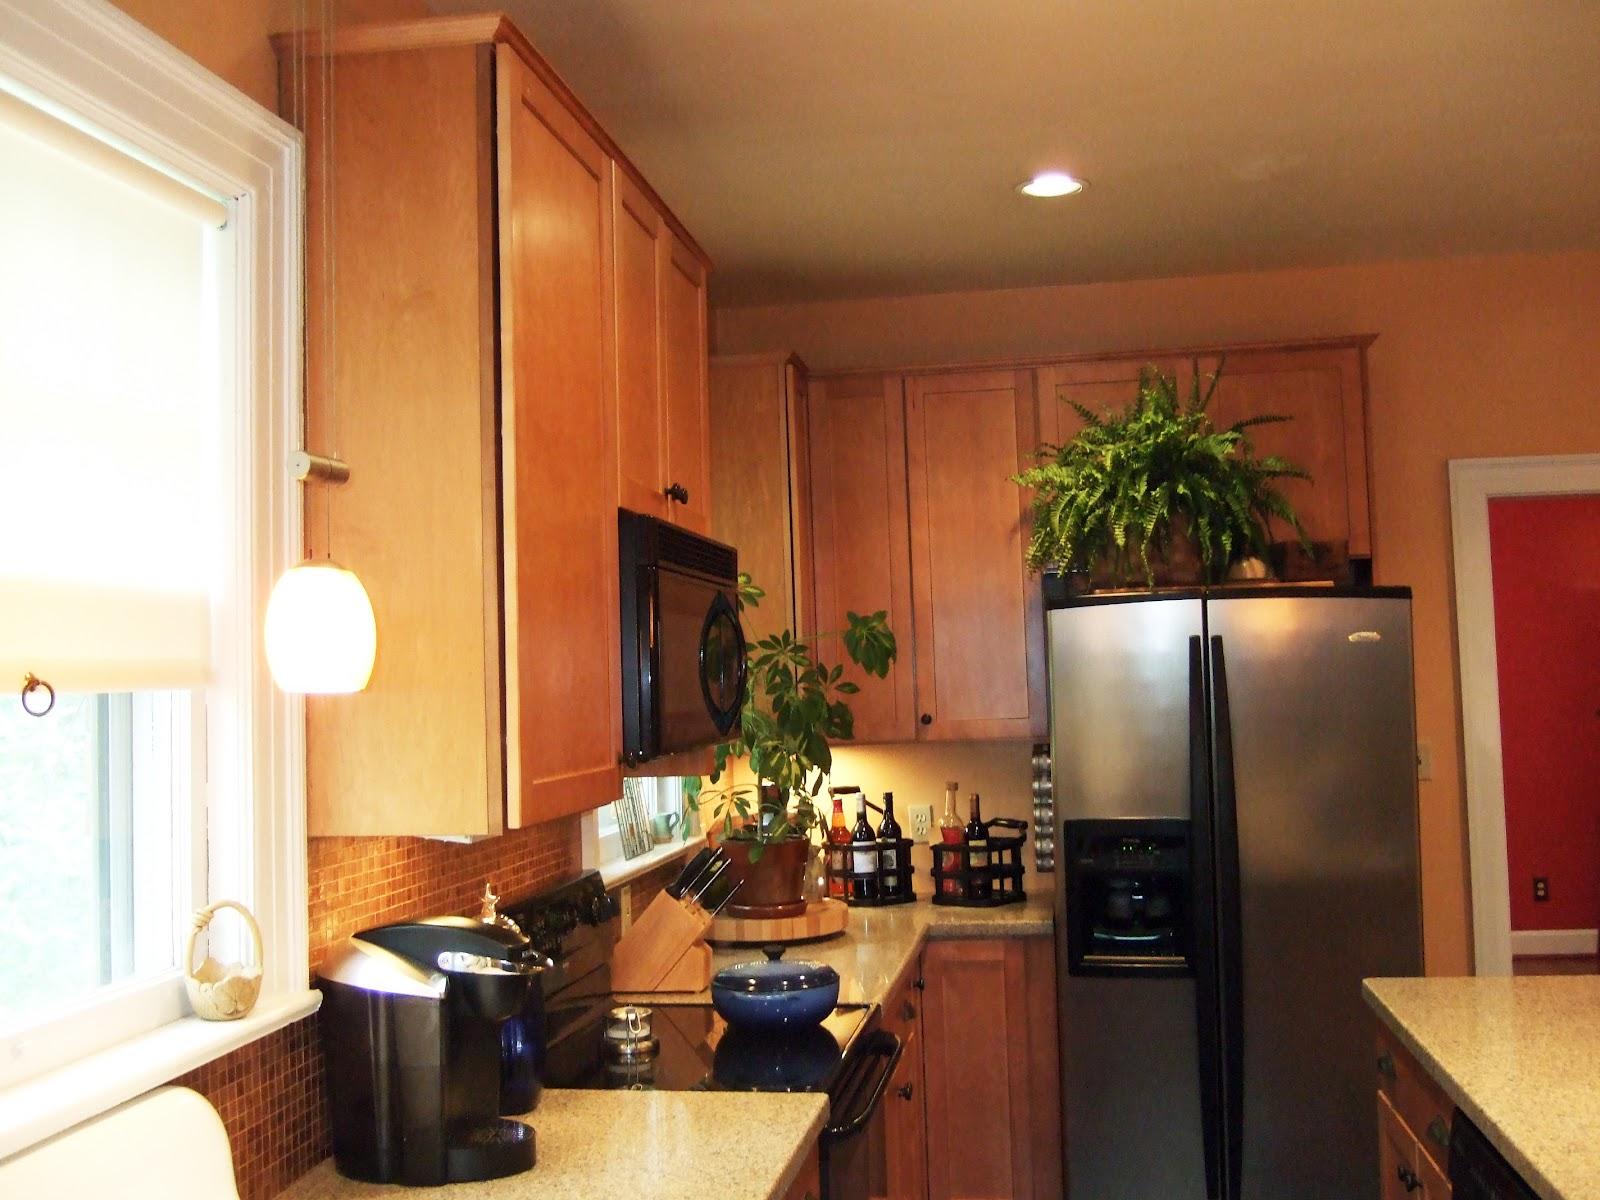 W D Osborne Design Construction 919 493 2936 Kitchen Design Remodel